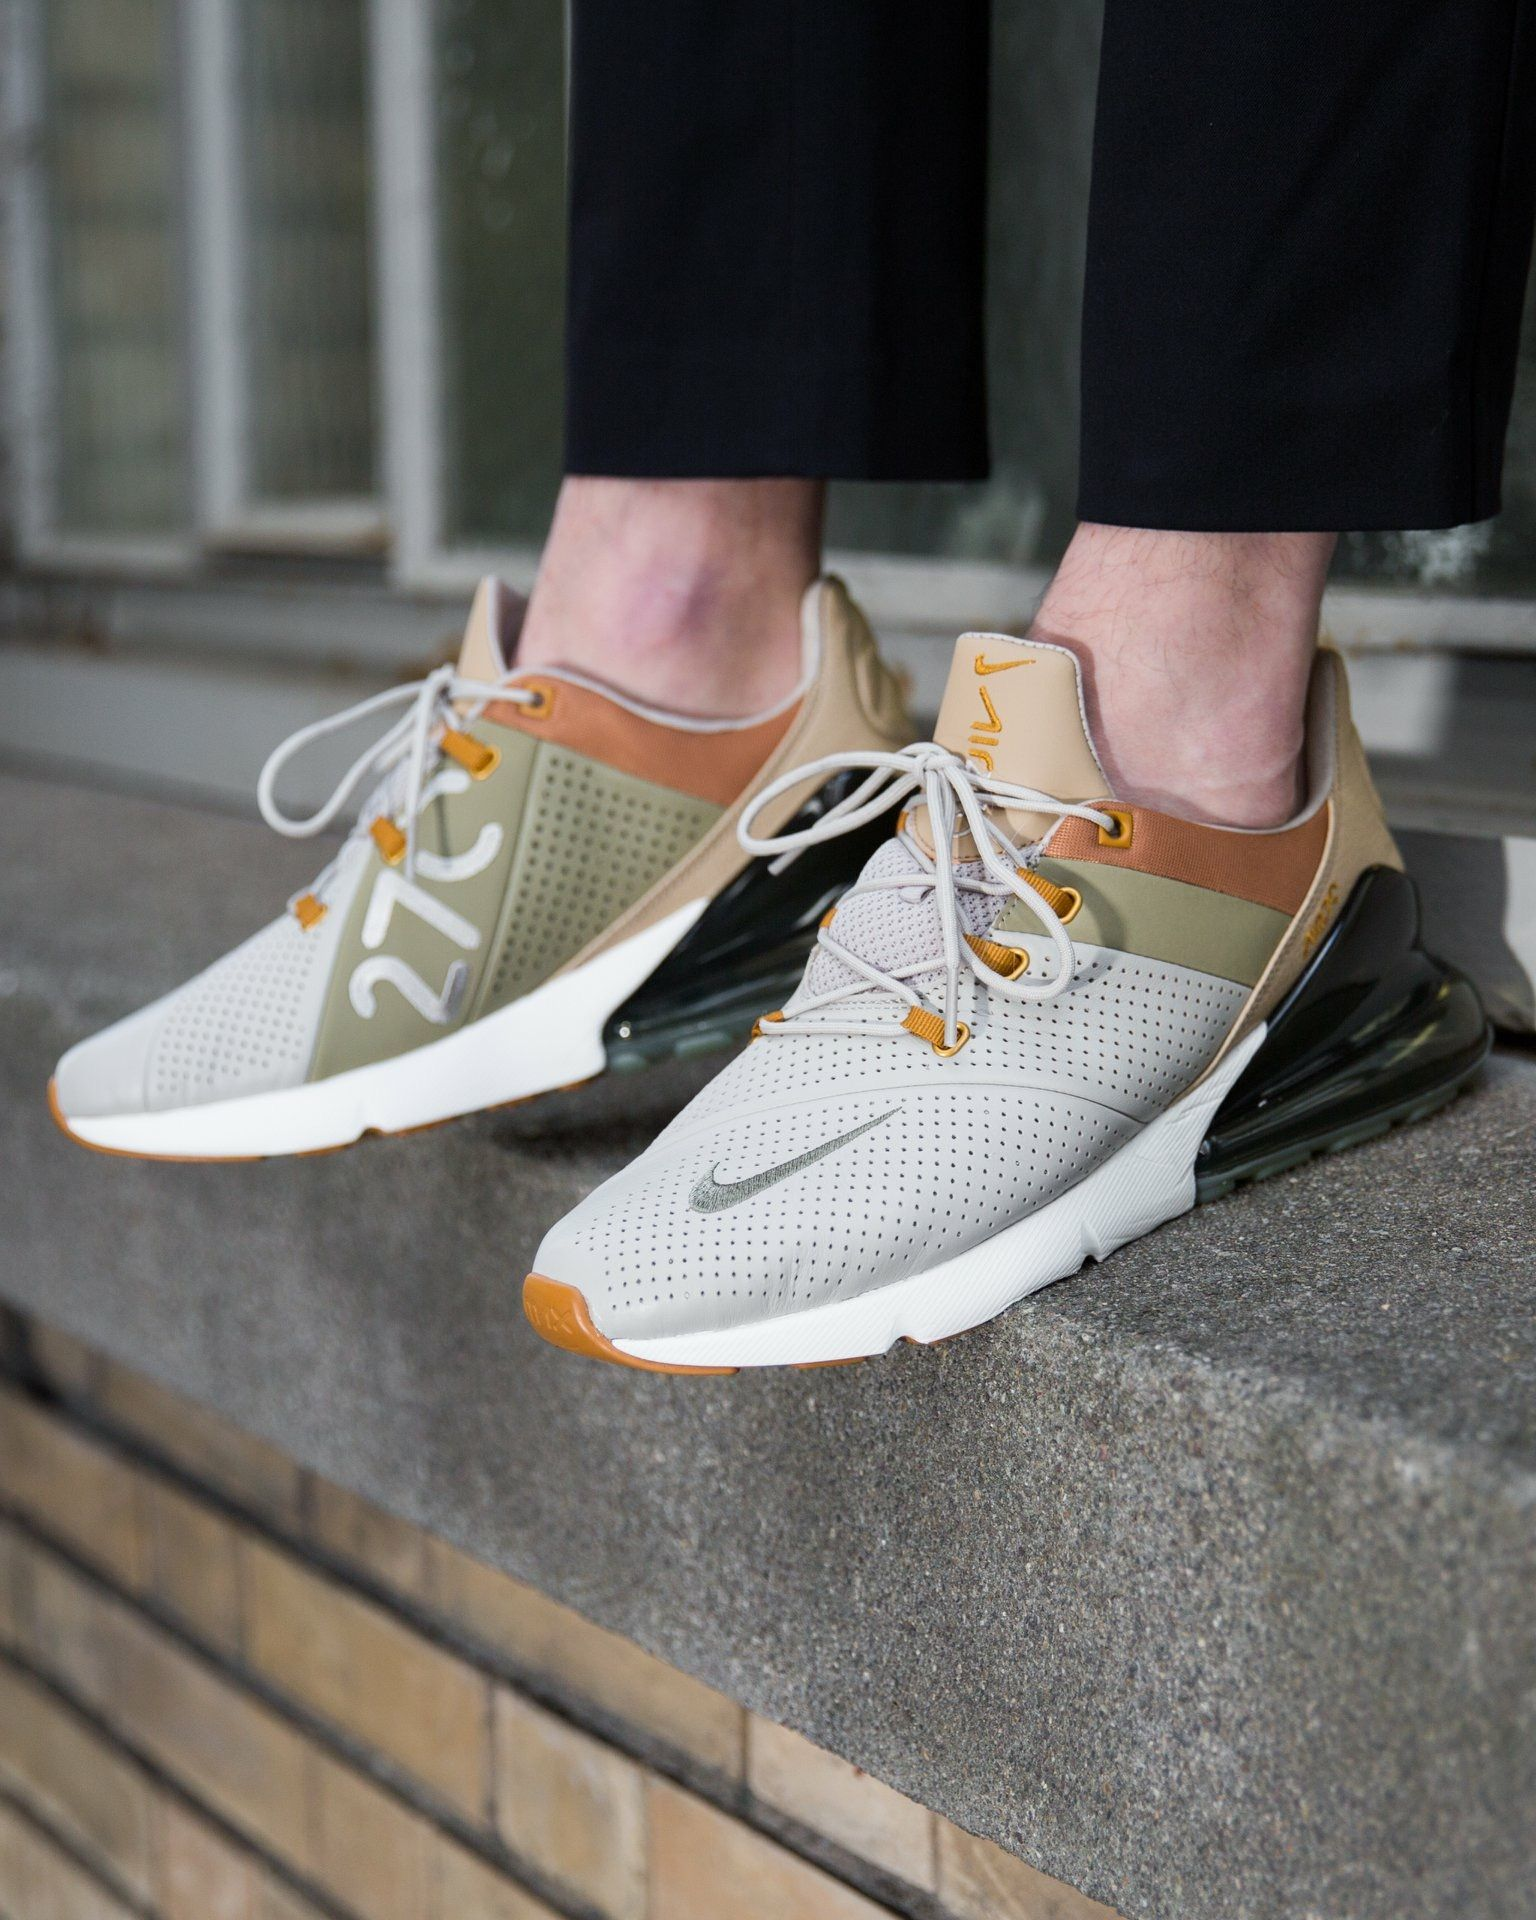 Nike Air Max 270 Premium 'Desert Ochre' | shoes.. and